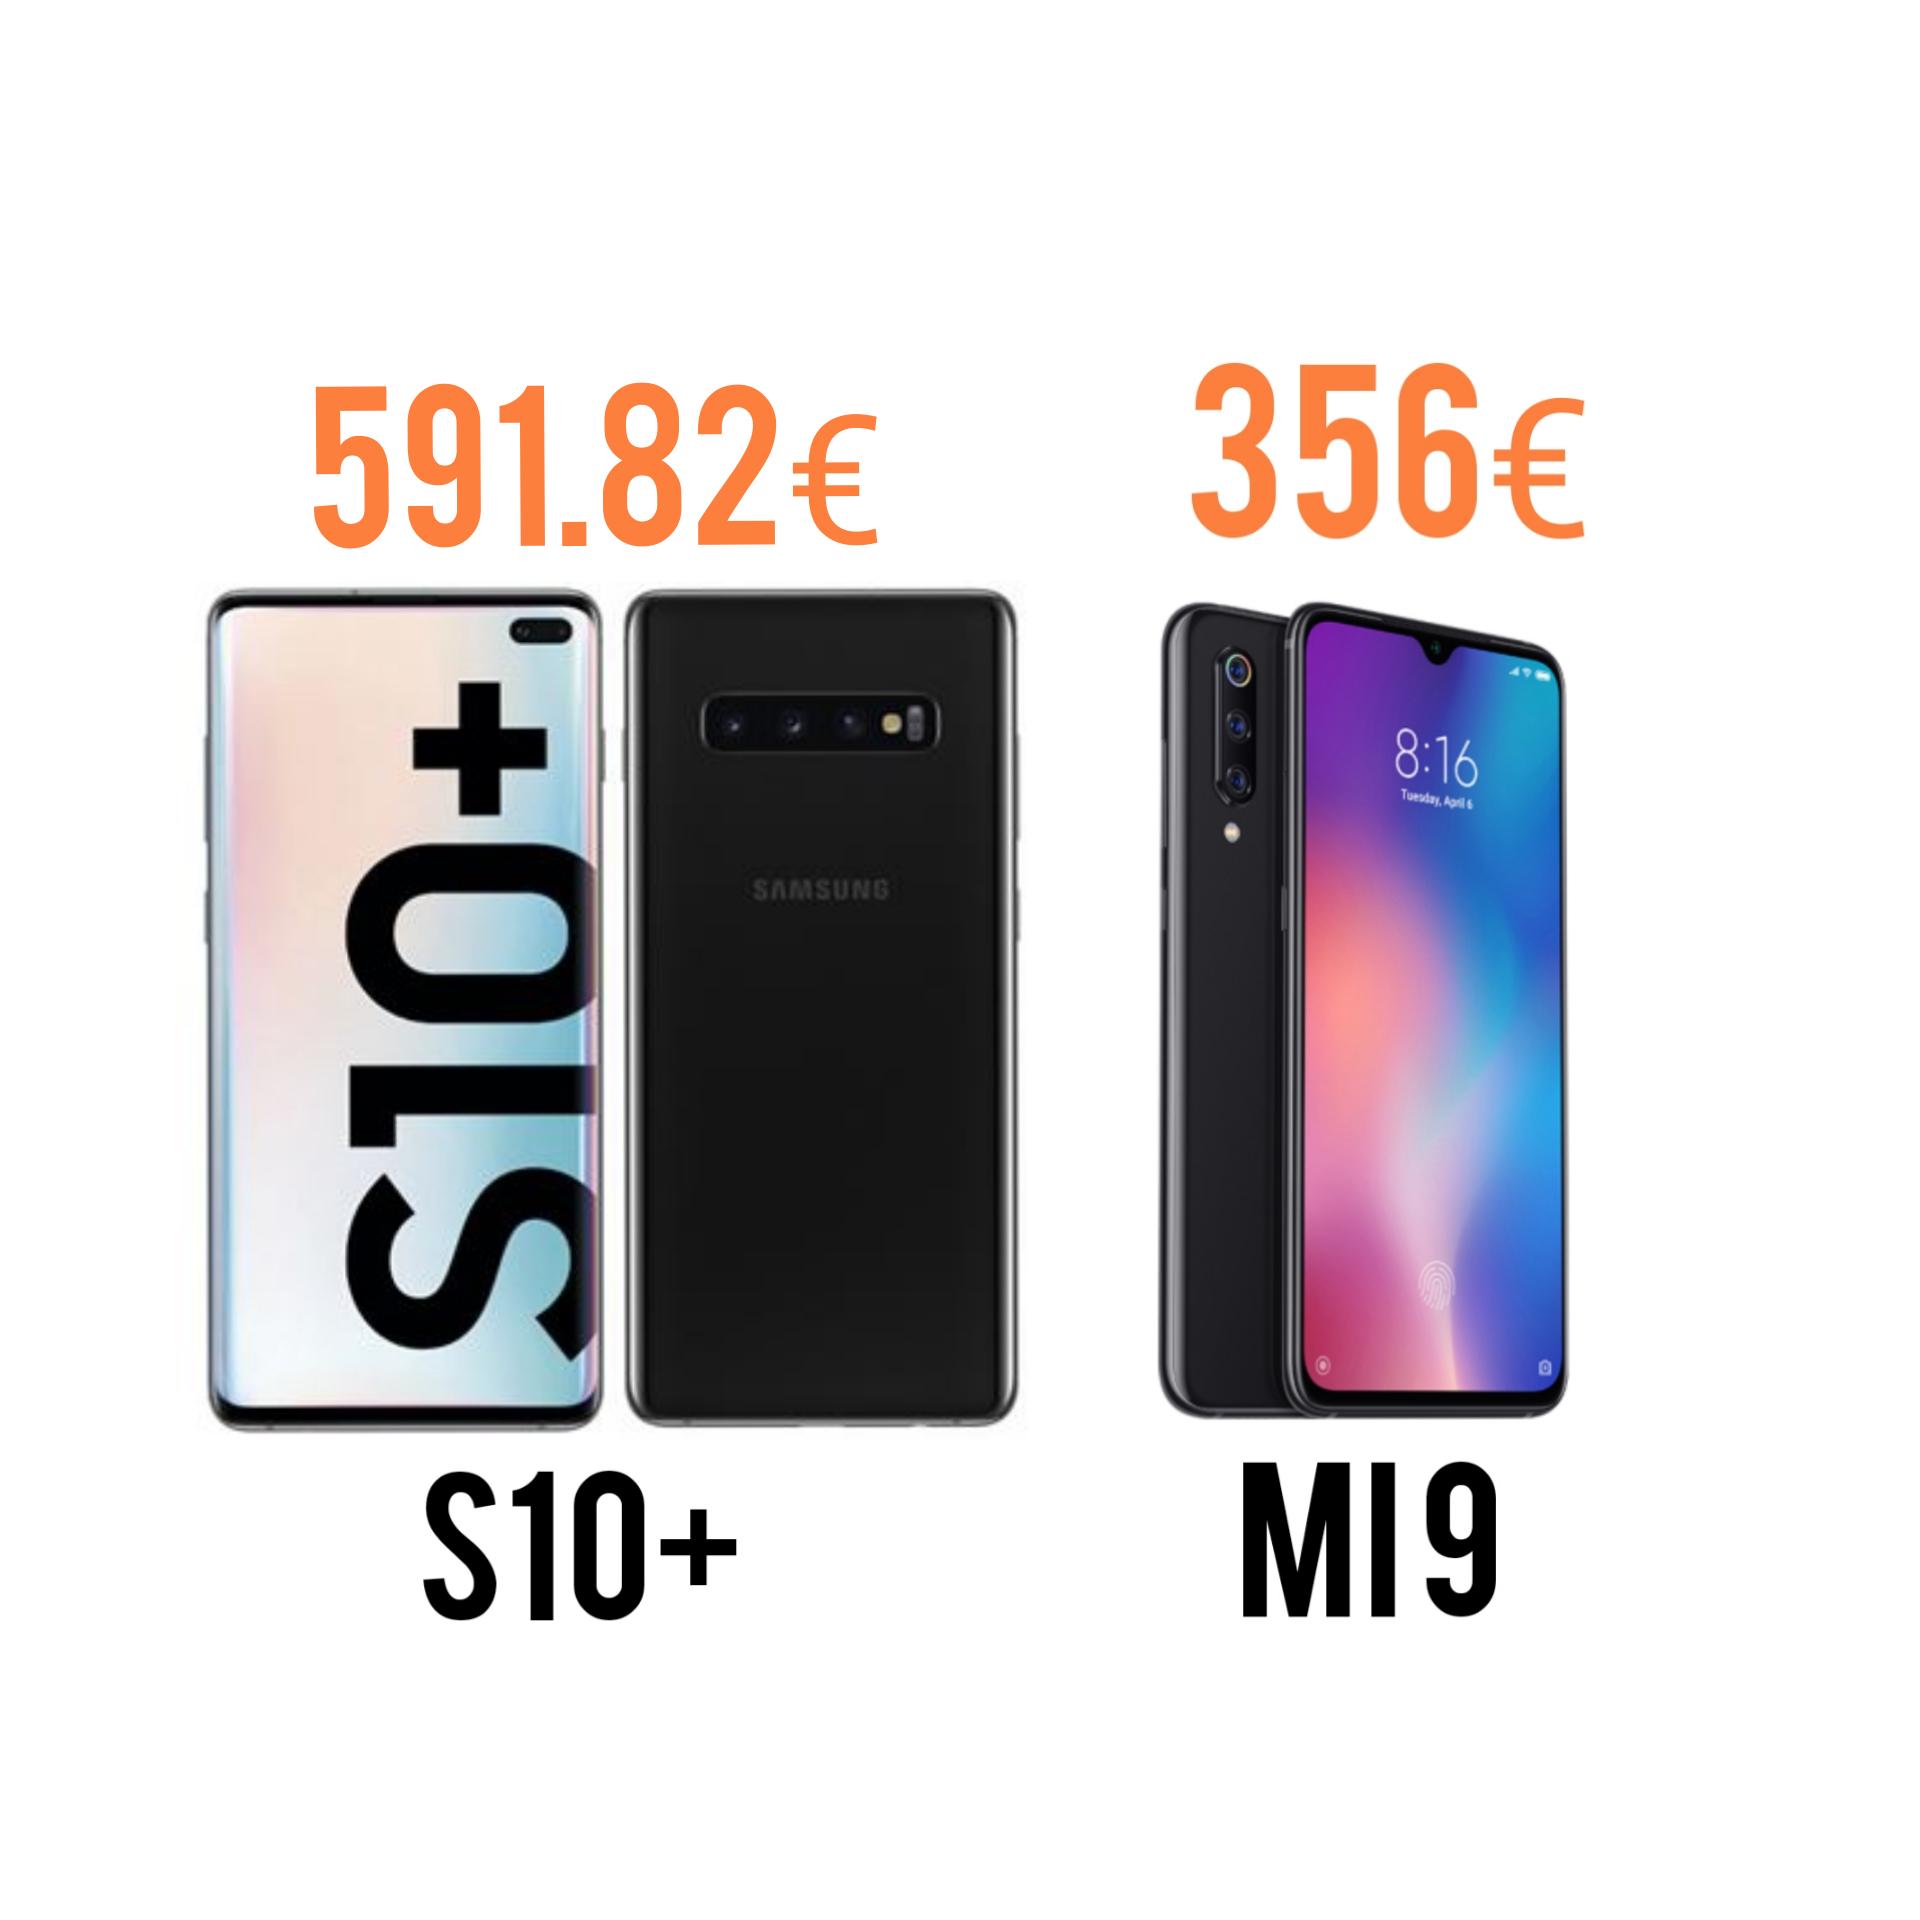 Samsung Galaxy S10+ (591.82€) | Xiaomi Mi 9 (356.82€)